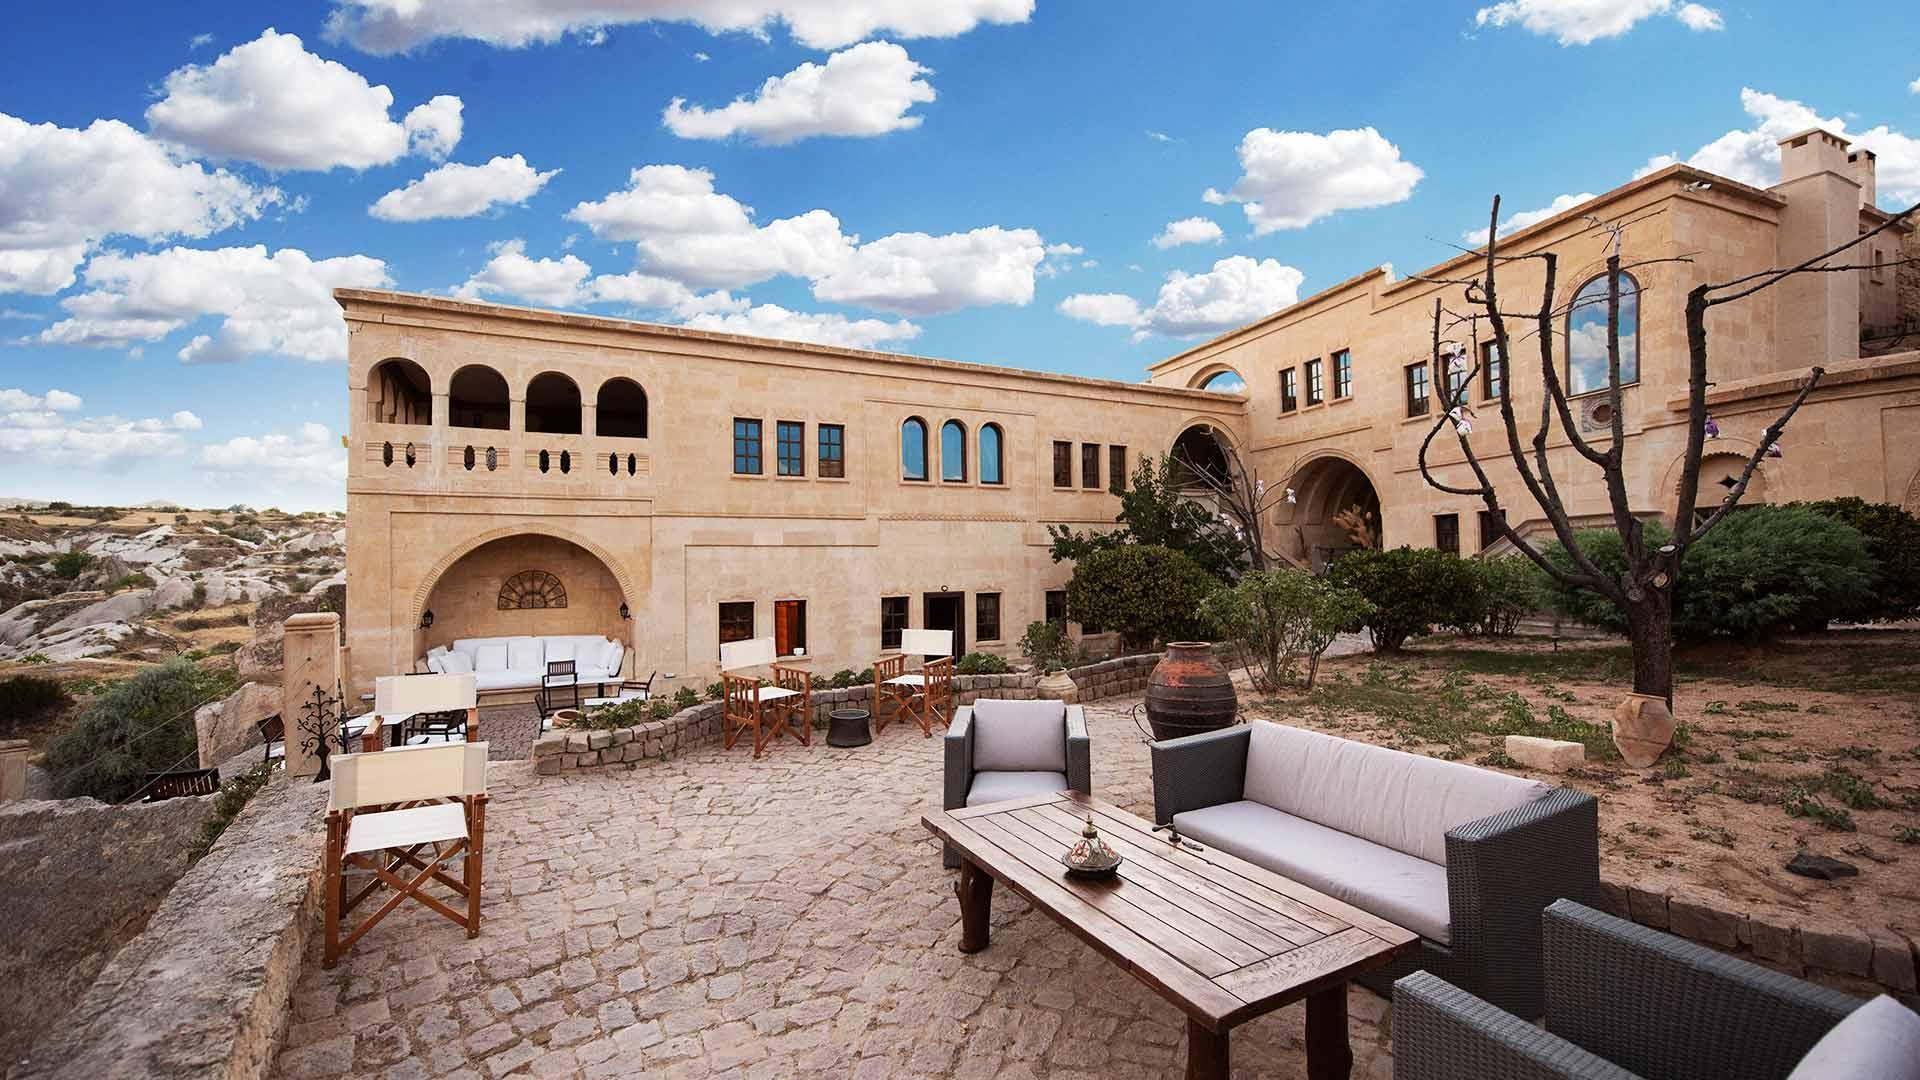 Hatti Cappadocia Hotel